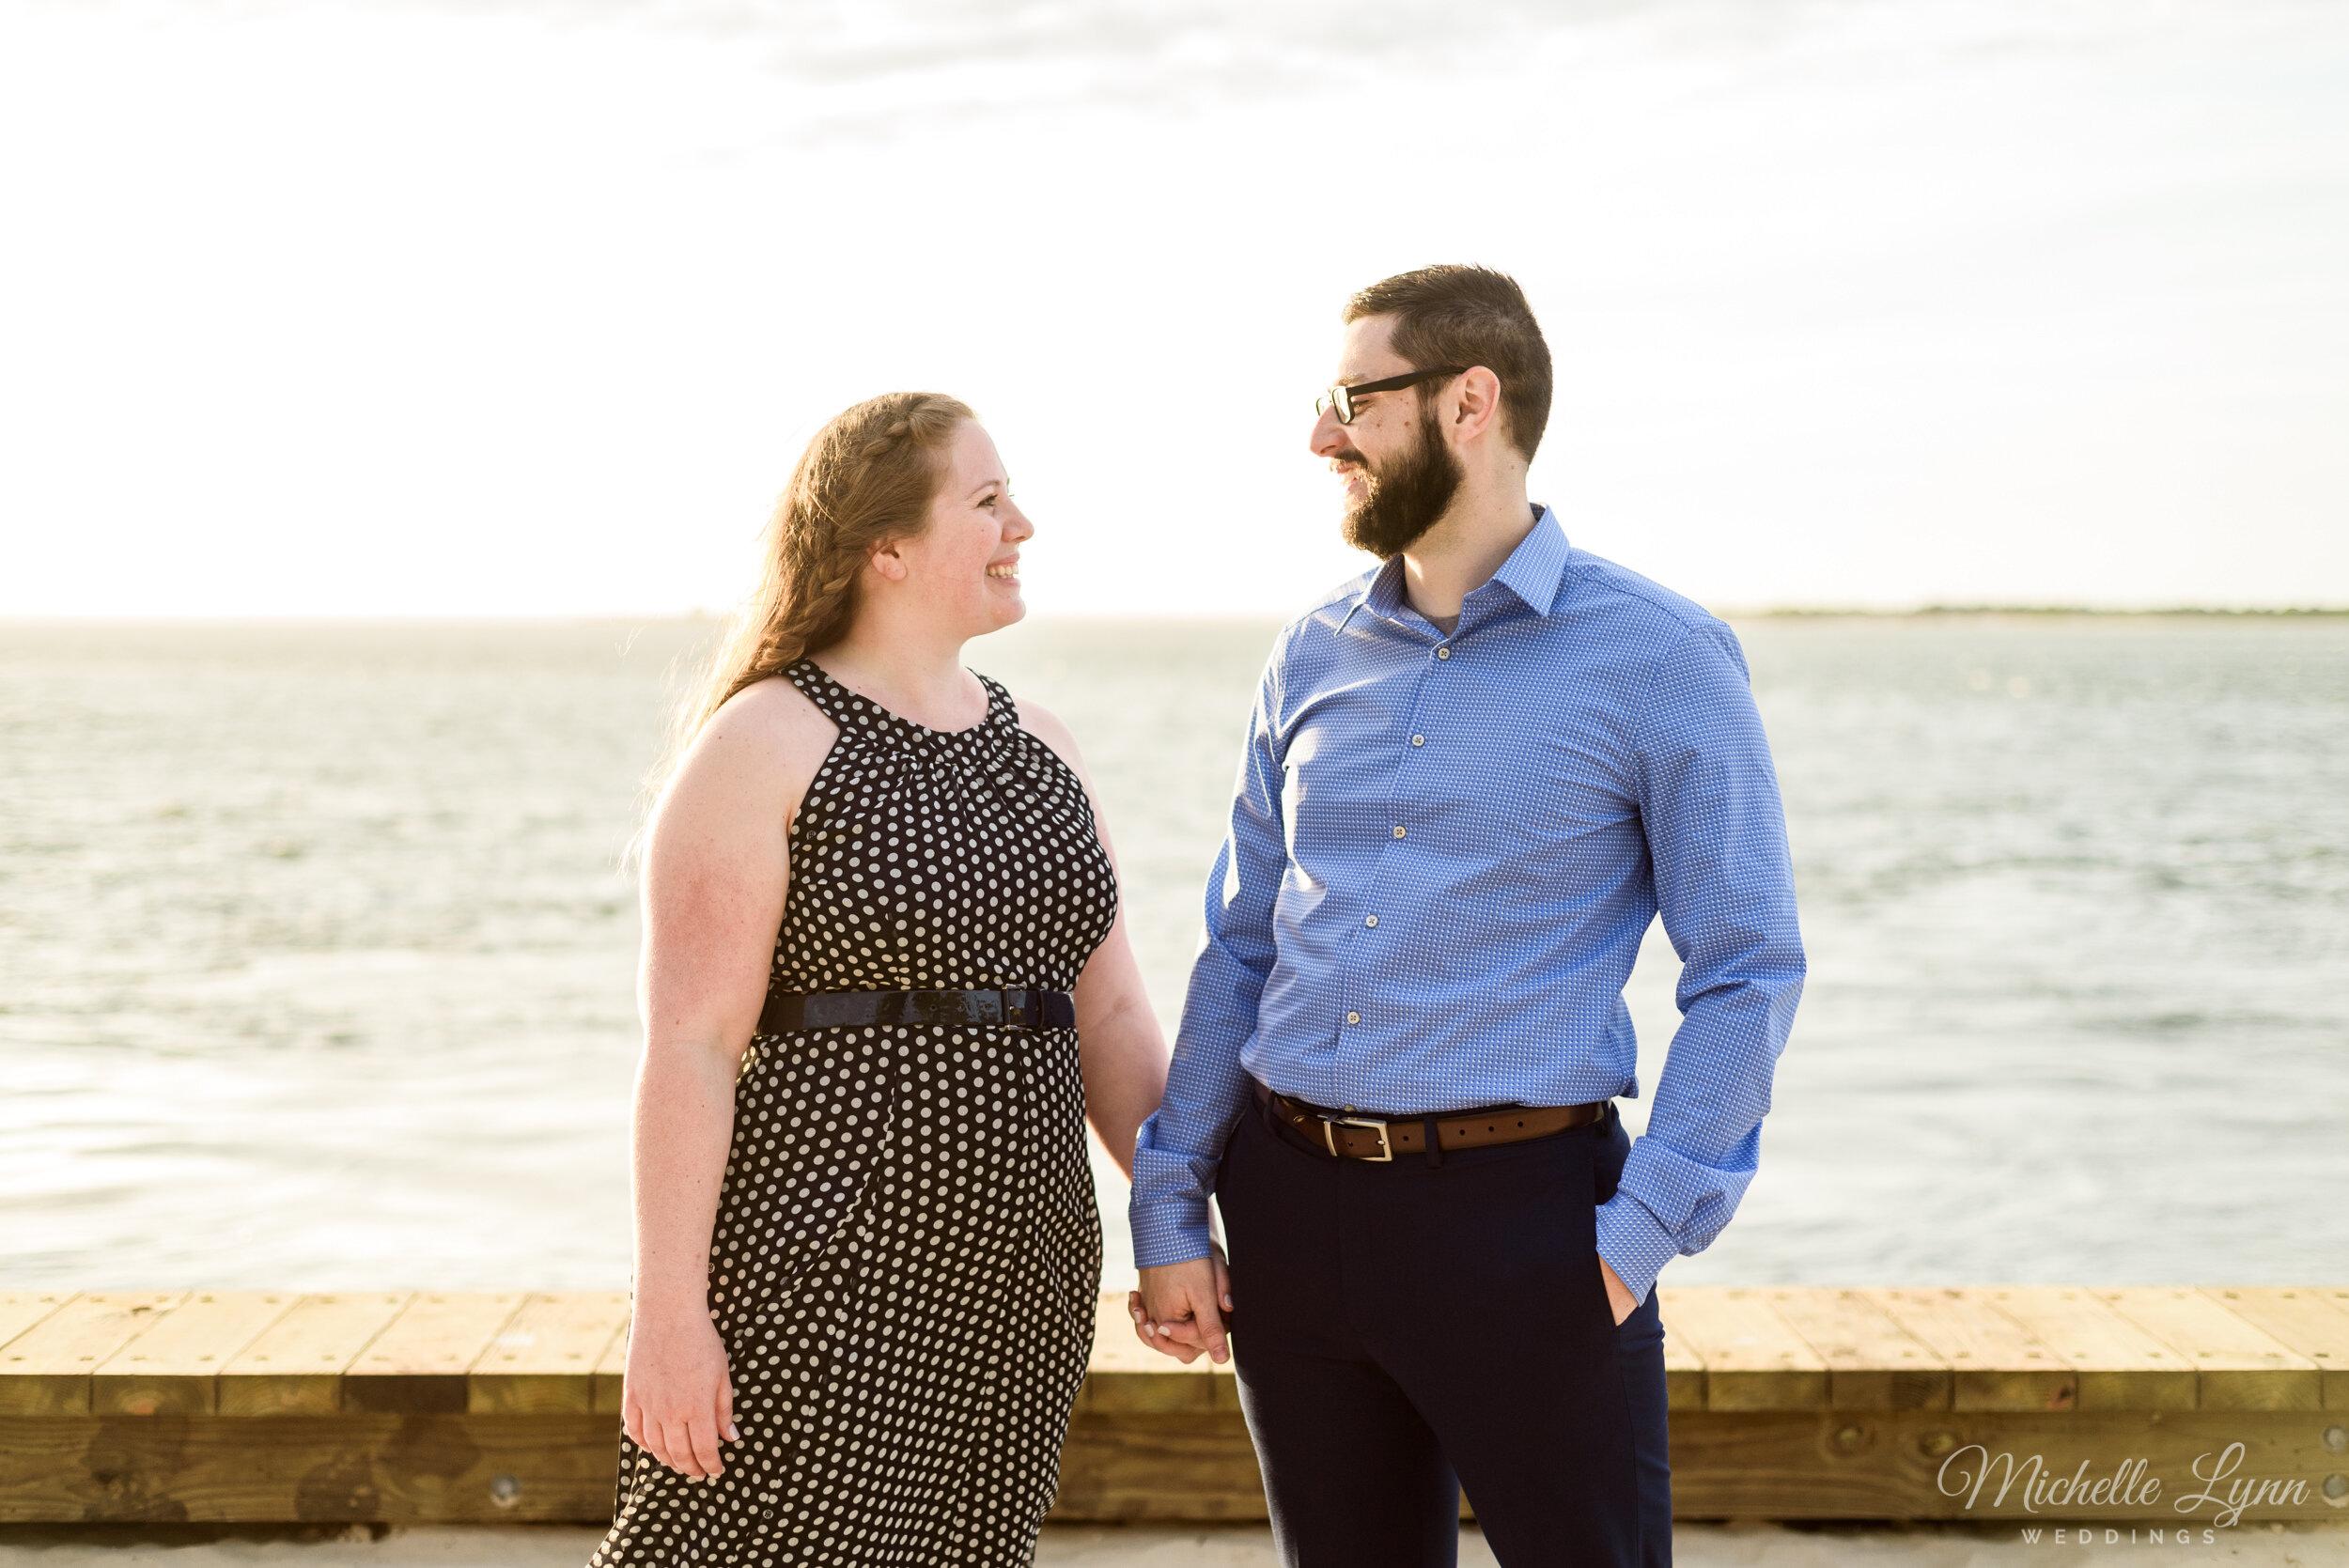 barnegat-lighthouse-engagement-photos-michelle-lynn-weddings-20.jpg